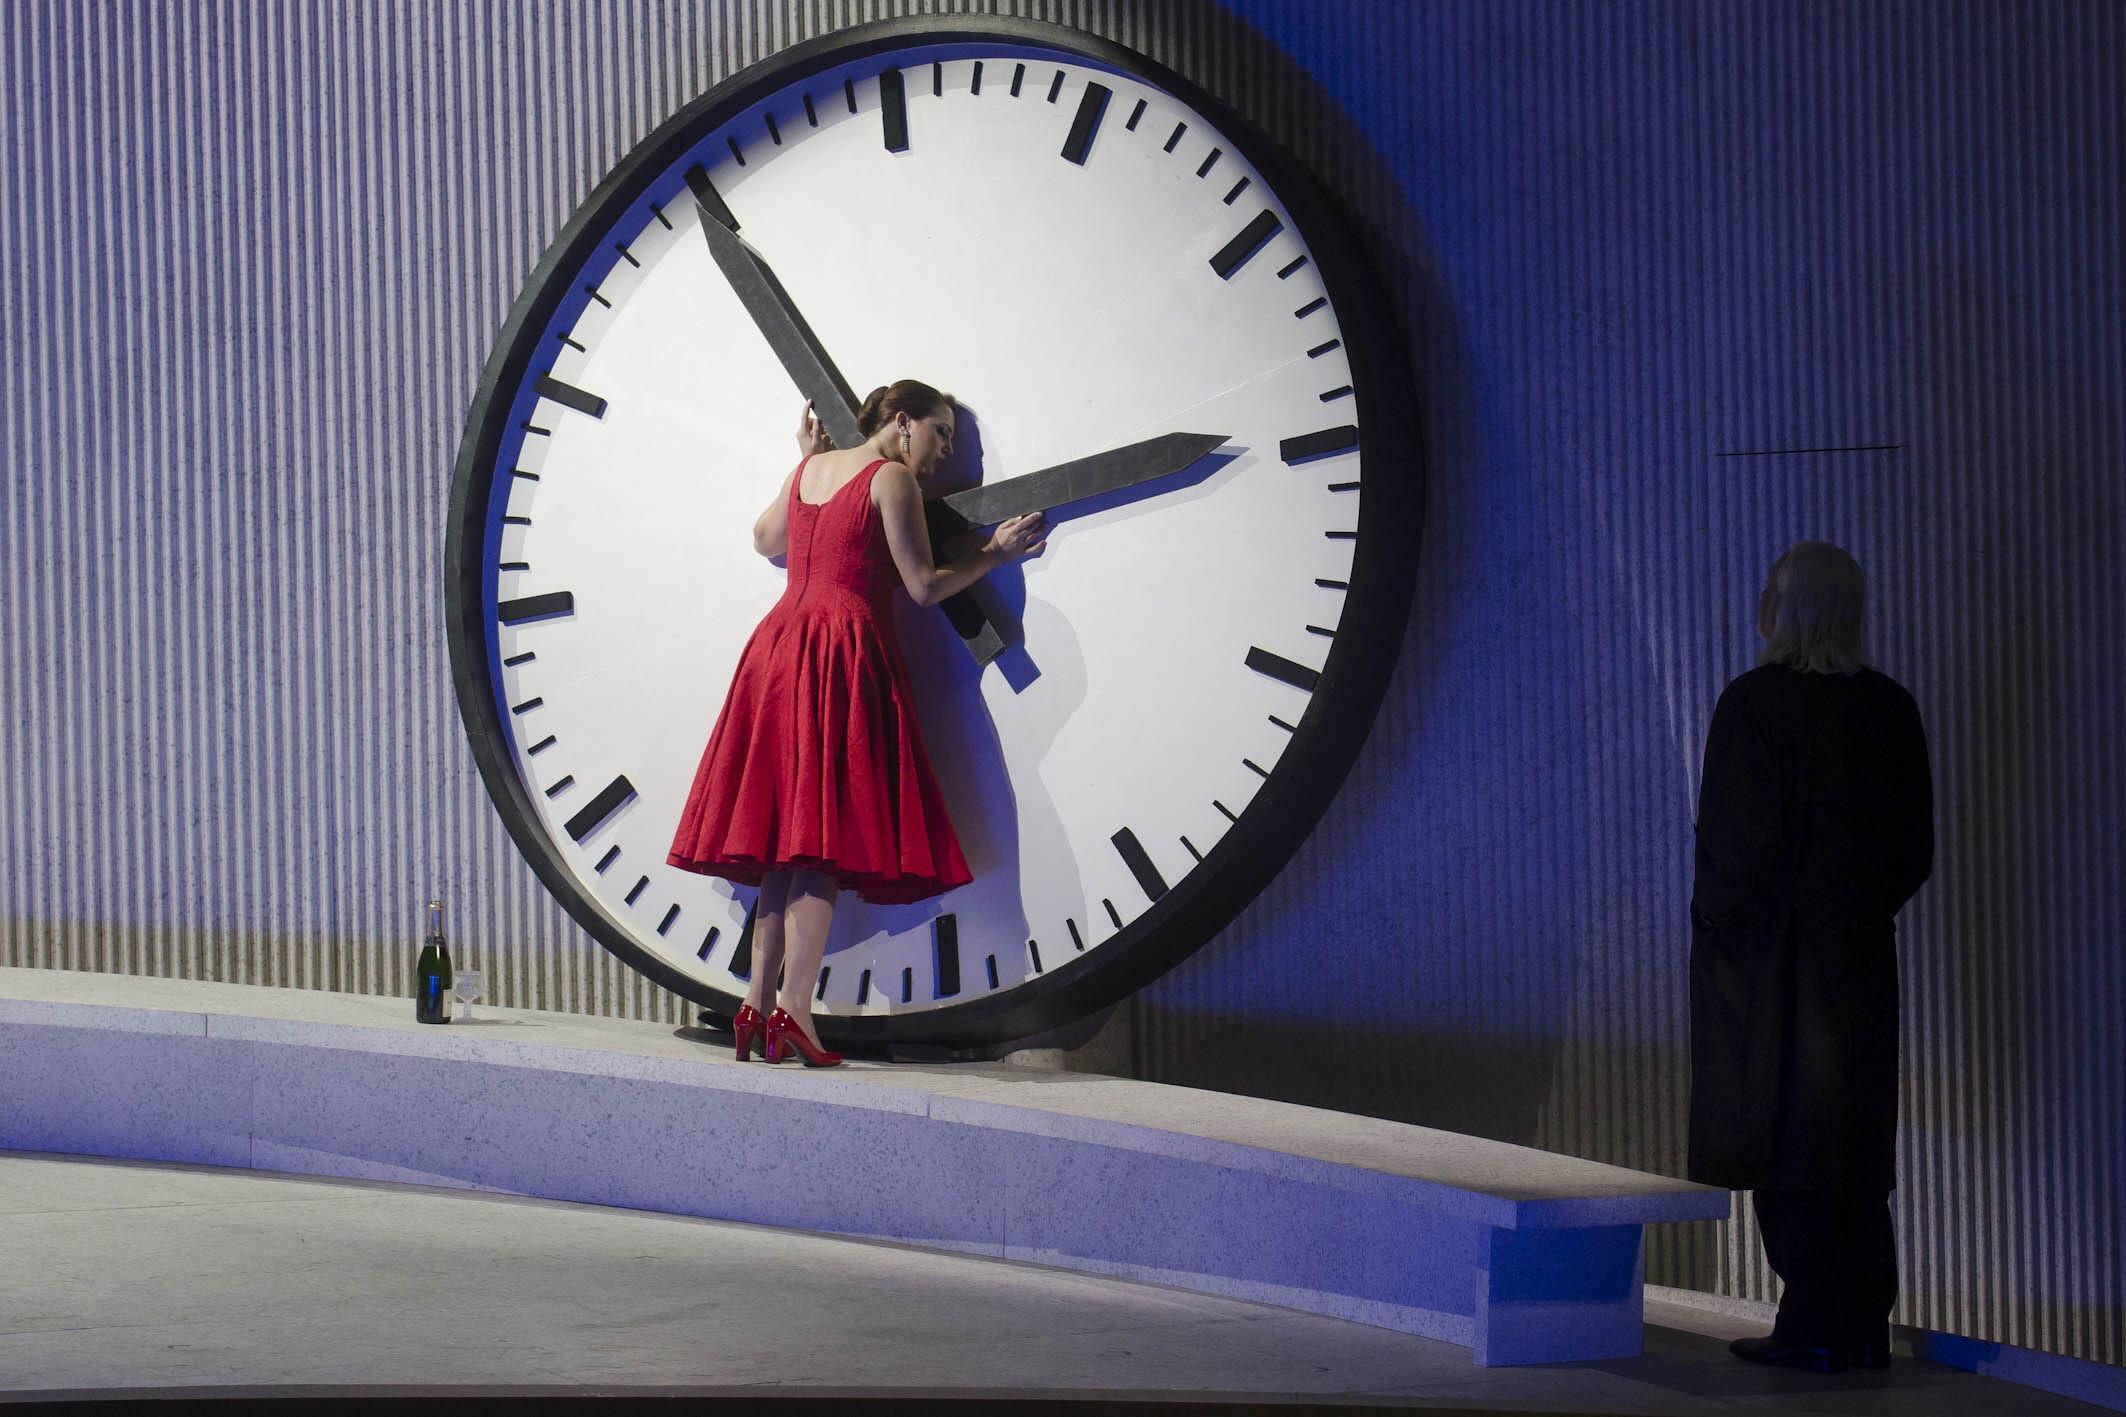 Zubin Mehta inaugura la octava temporada de Palau de les Arts con La Traviata